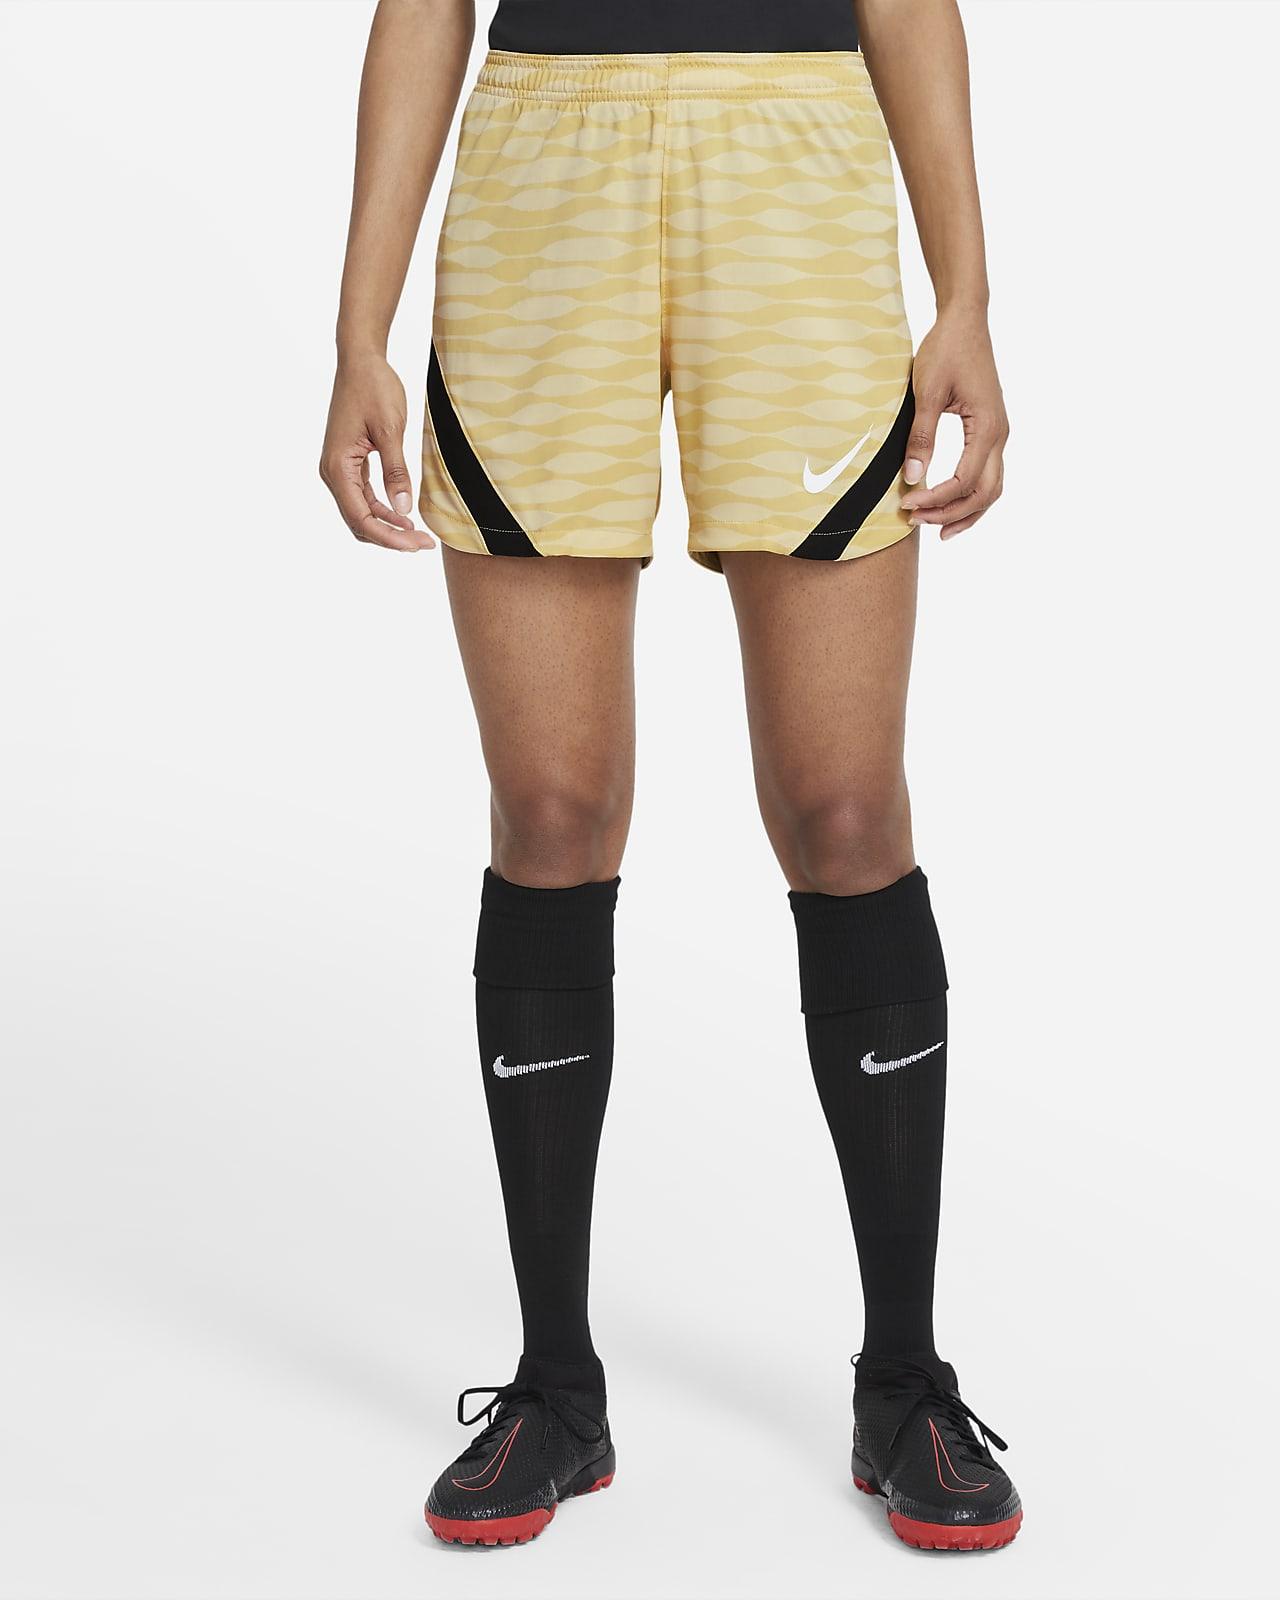 Shorts de fútbol tejidos para mujer Nike Dri-FIT Strike